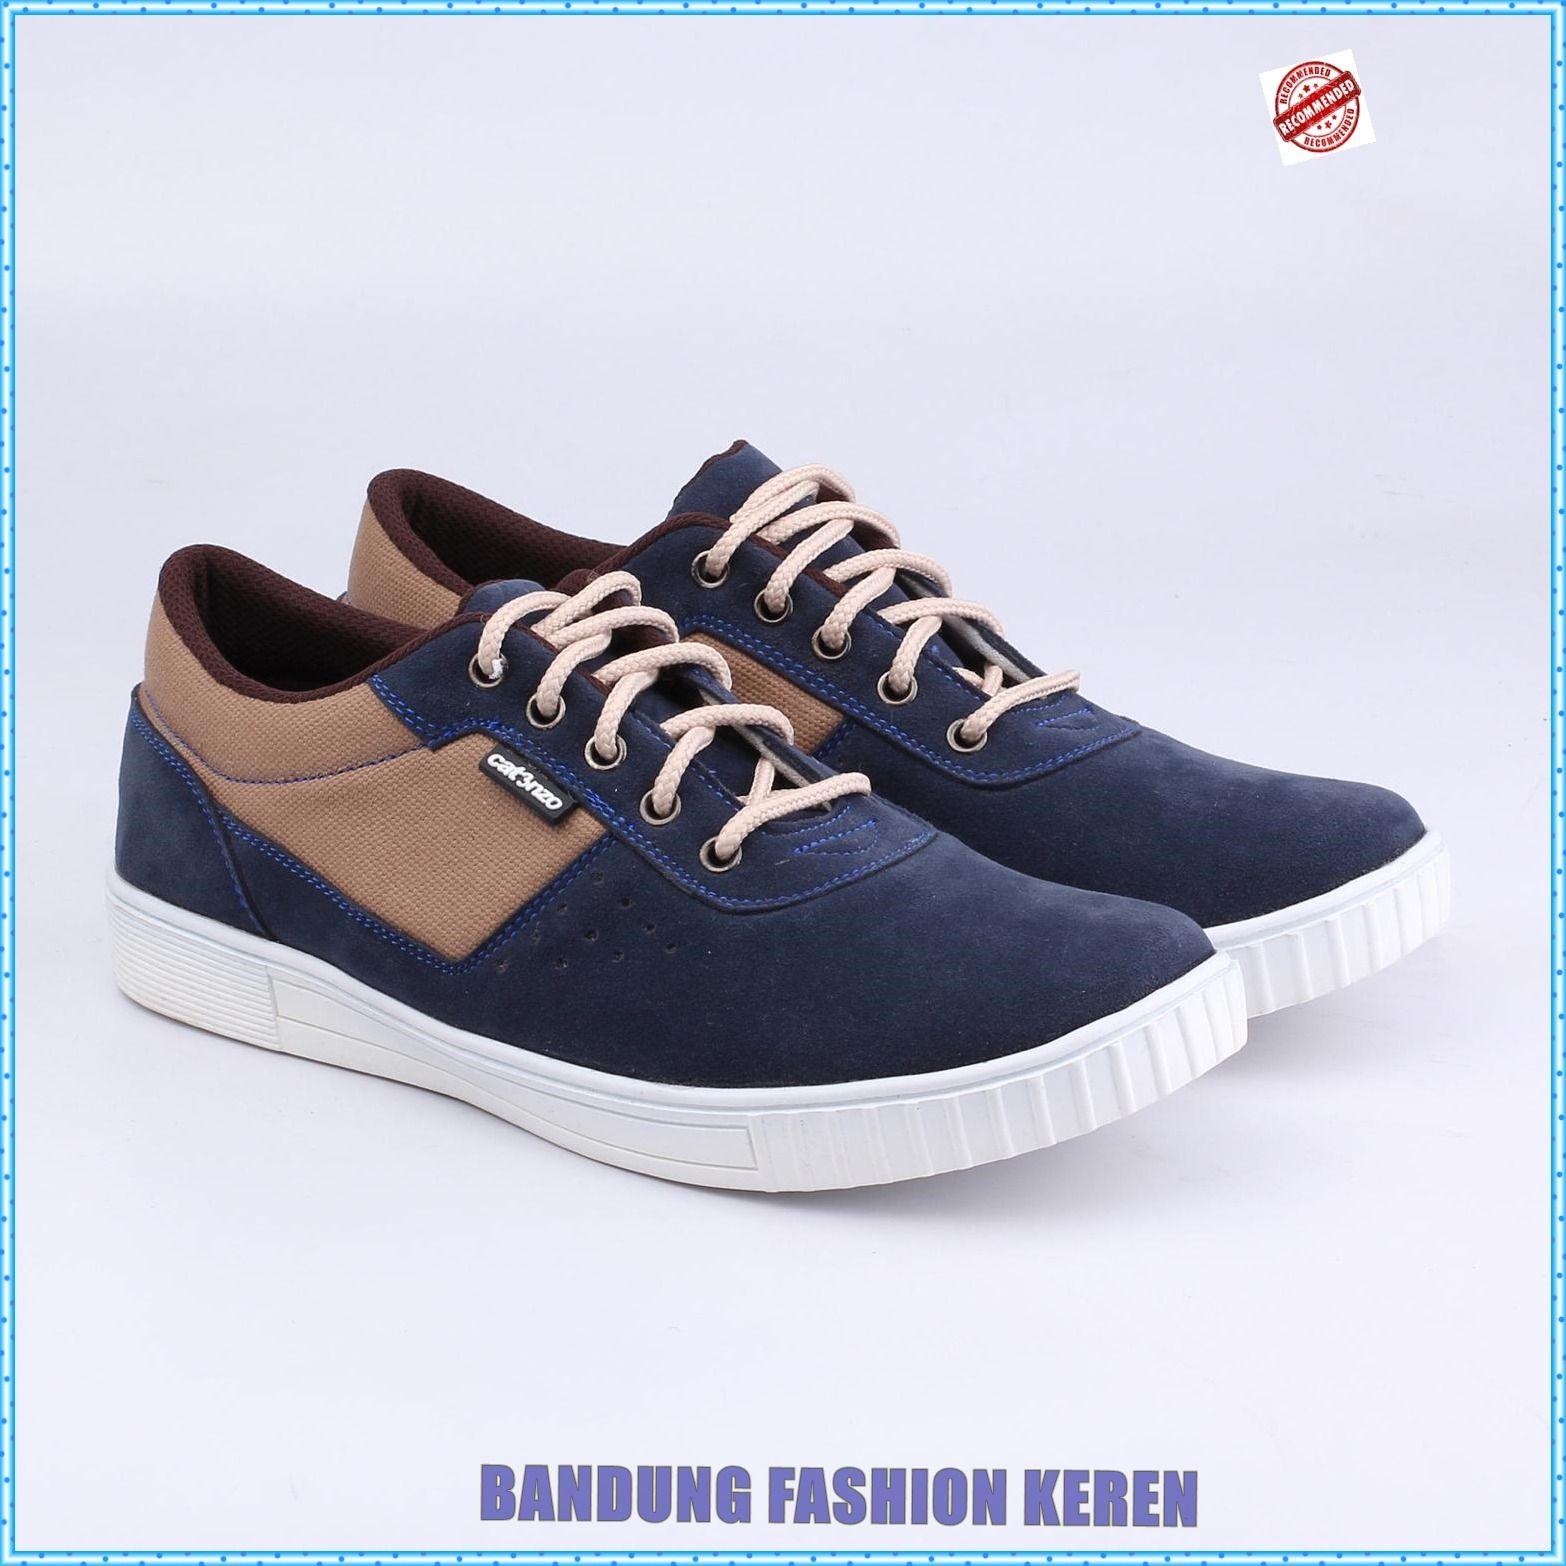 Sepatu Casual Pria Ny 085 Produk Fashion Handmade Terbaik 100